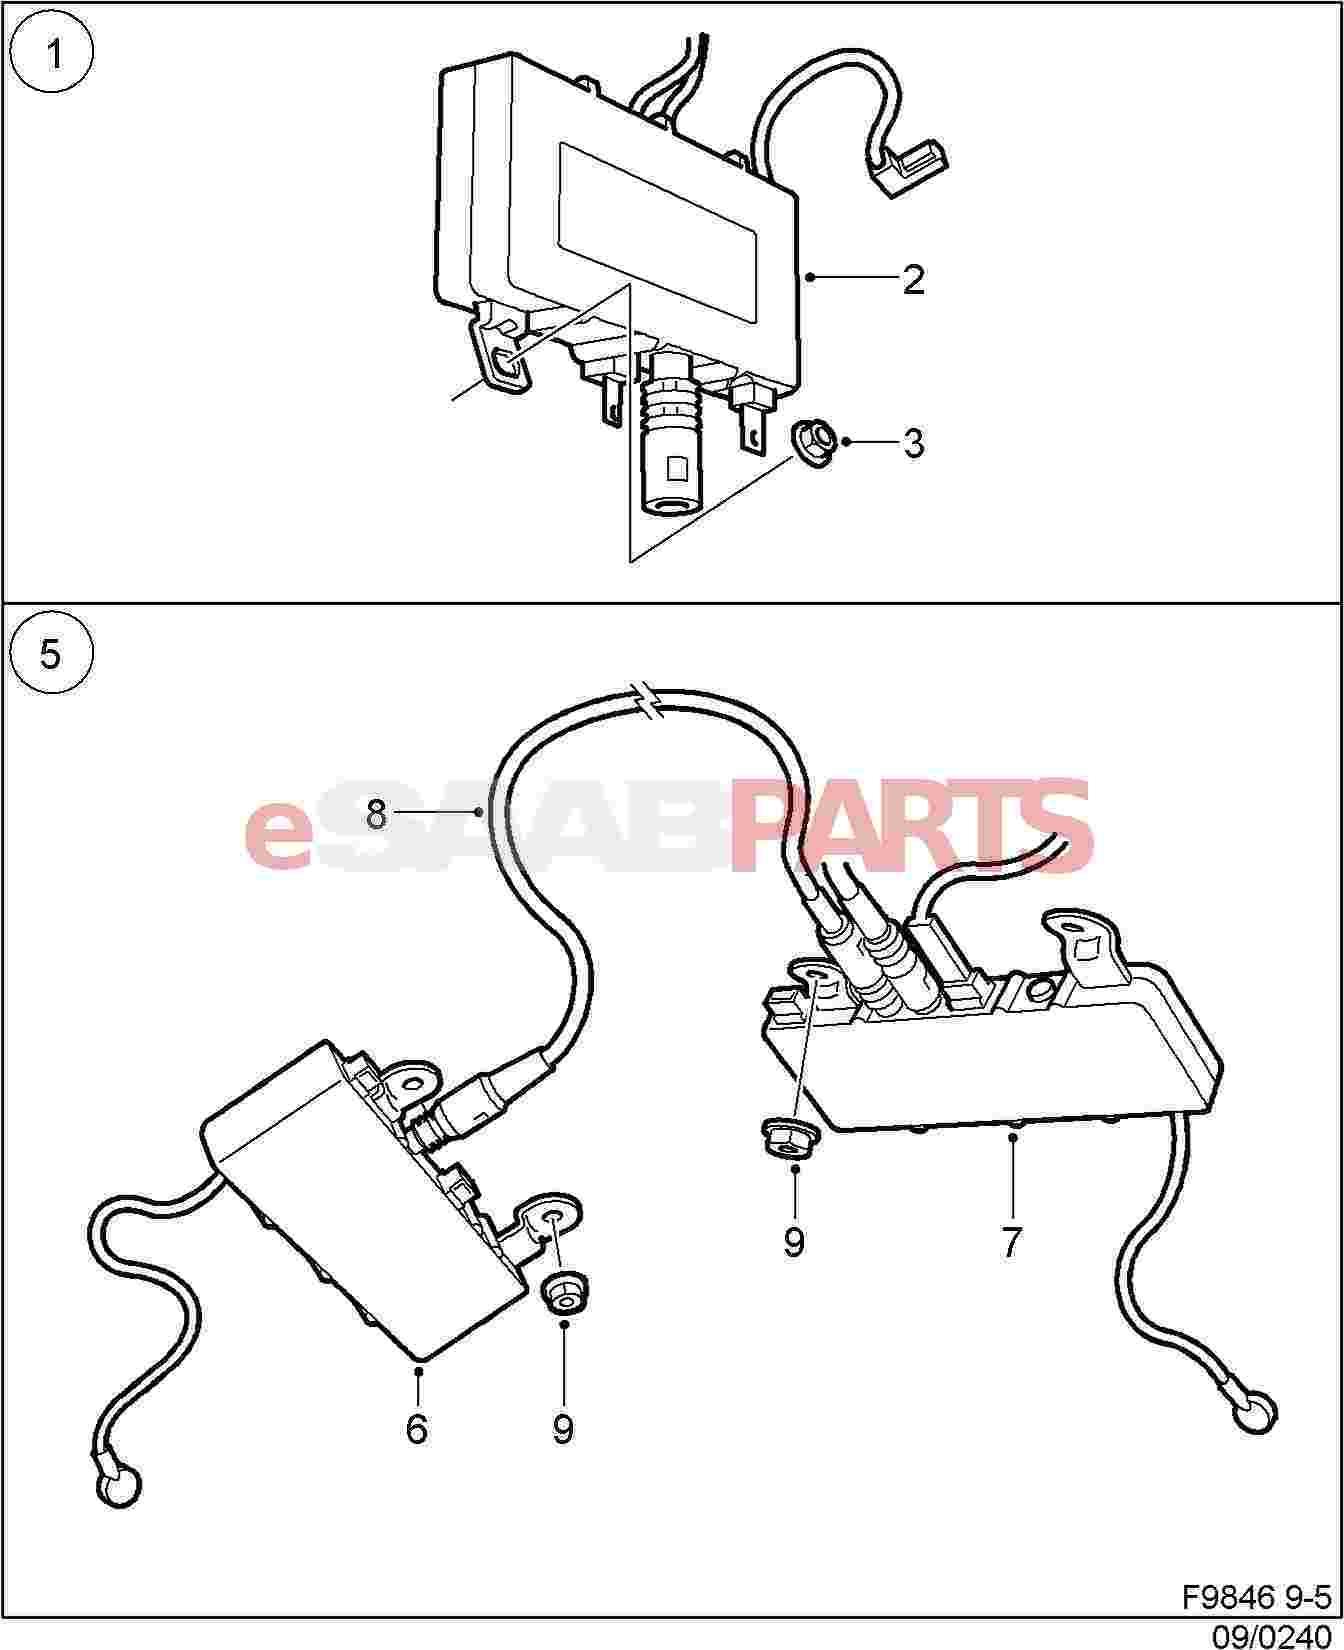 Saab 9 5 Wiring Diagram Electrical Sets Antenna